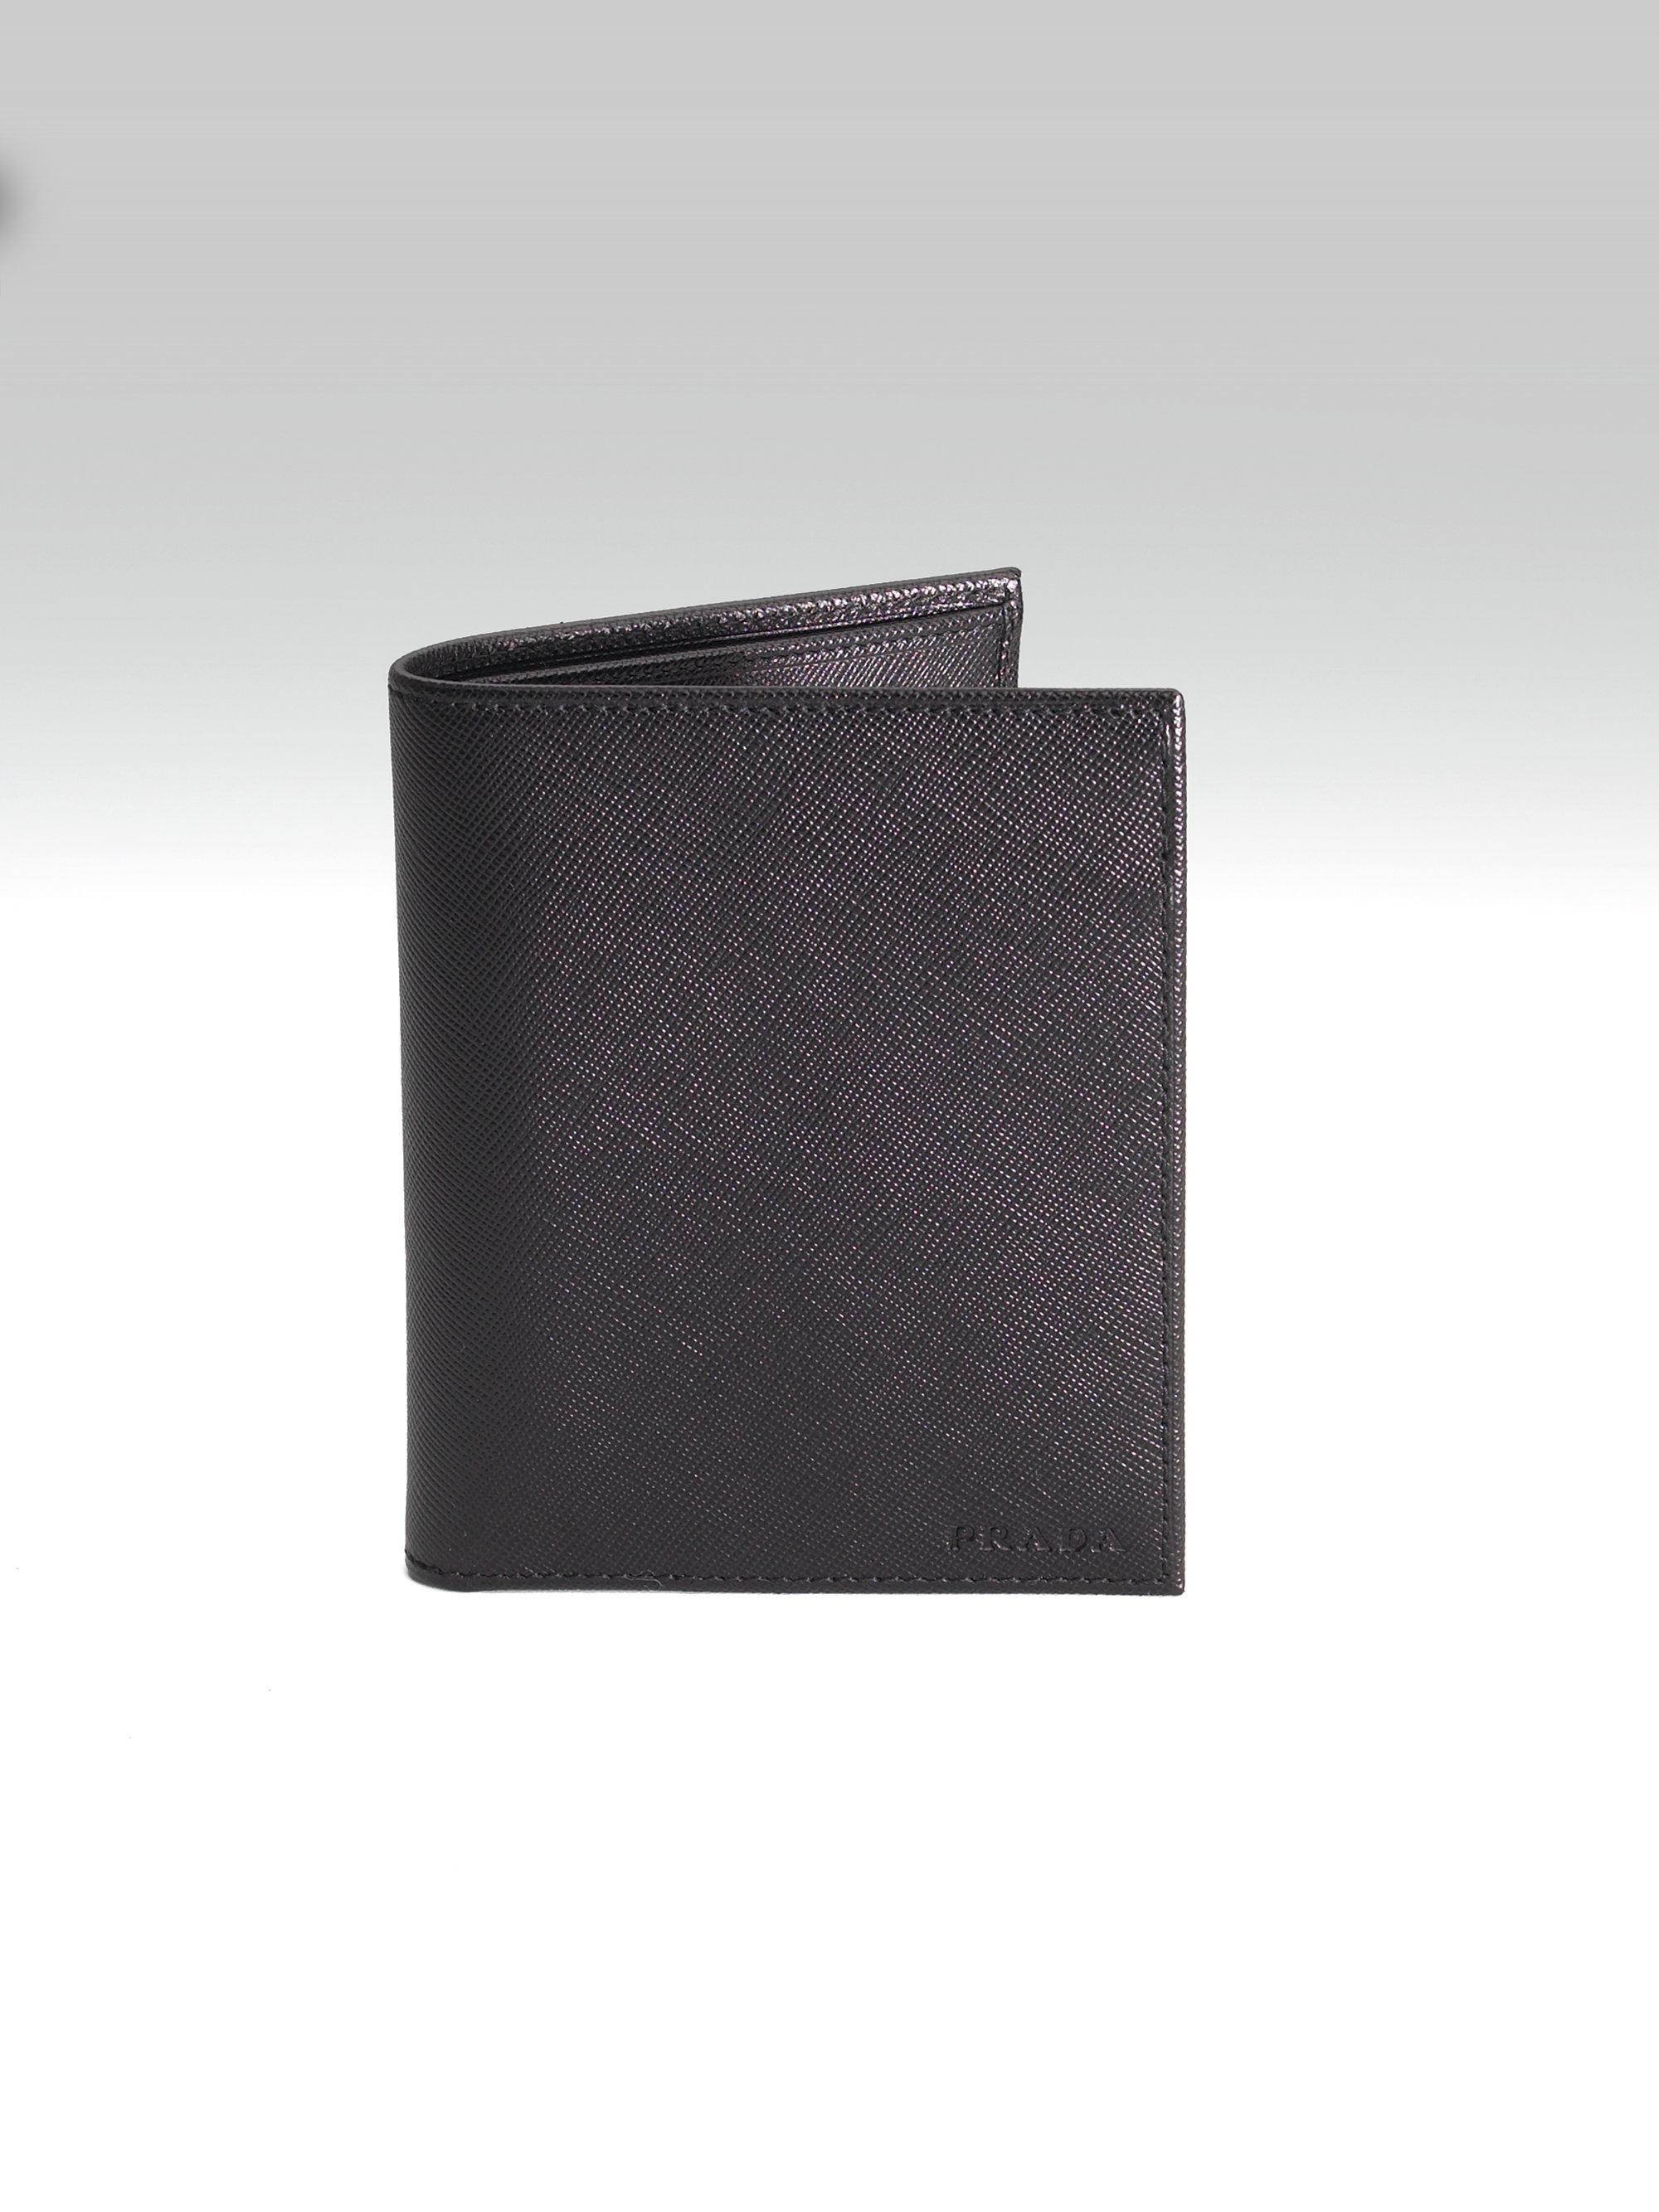 991cb20a0e0c Lyst - Prada Breast Pocket Wallet in Black